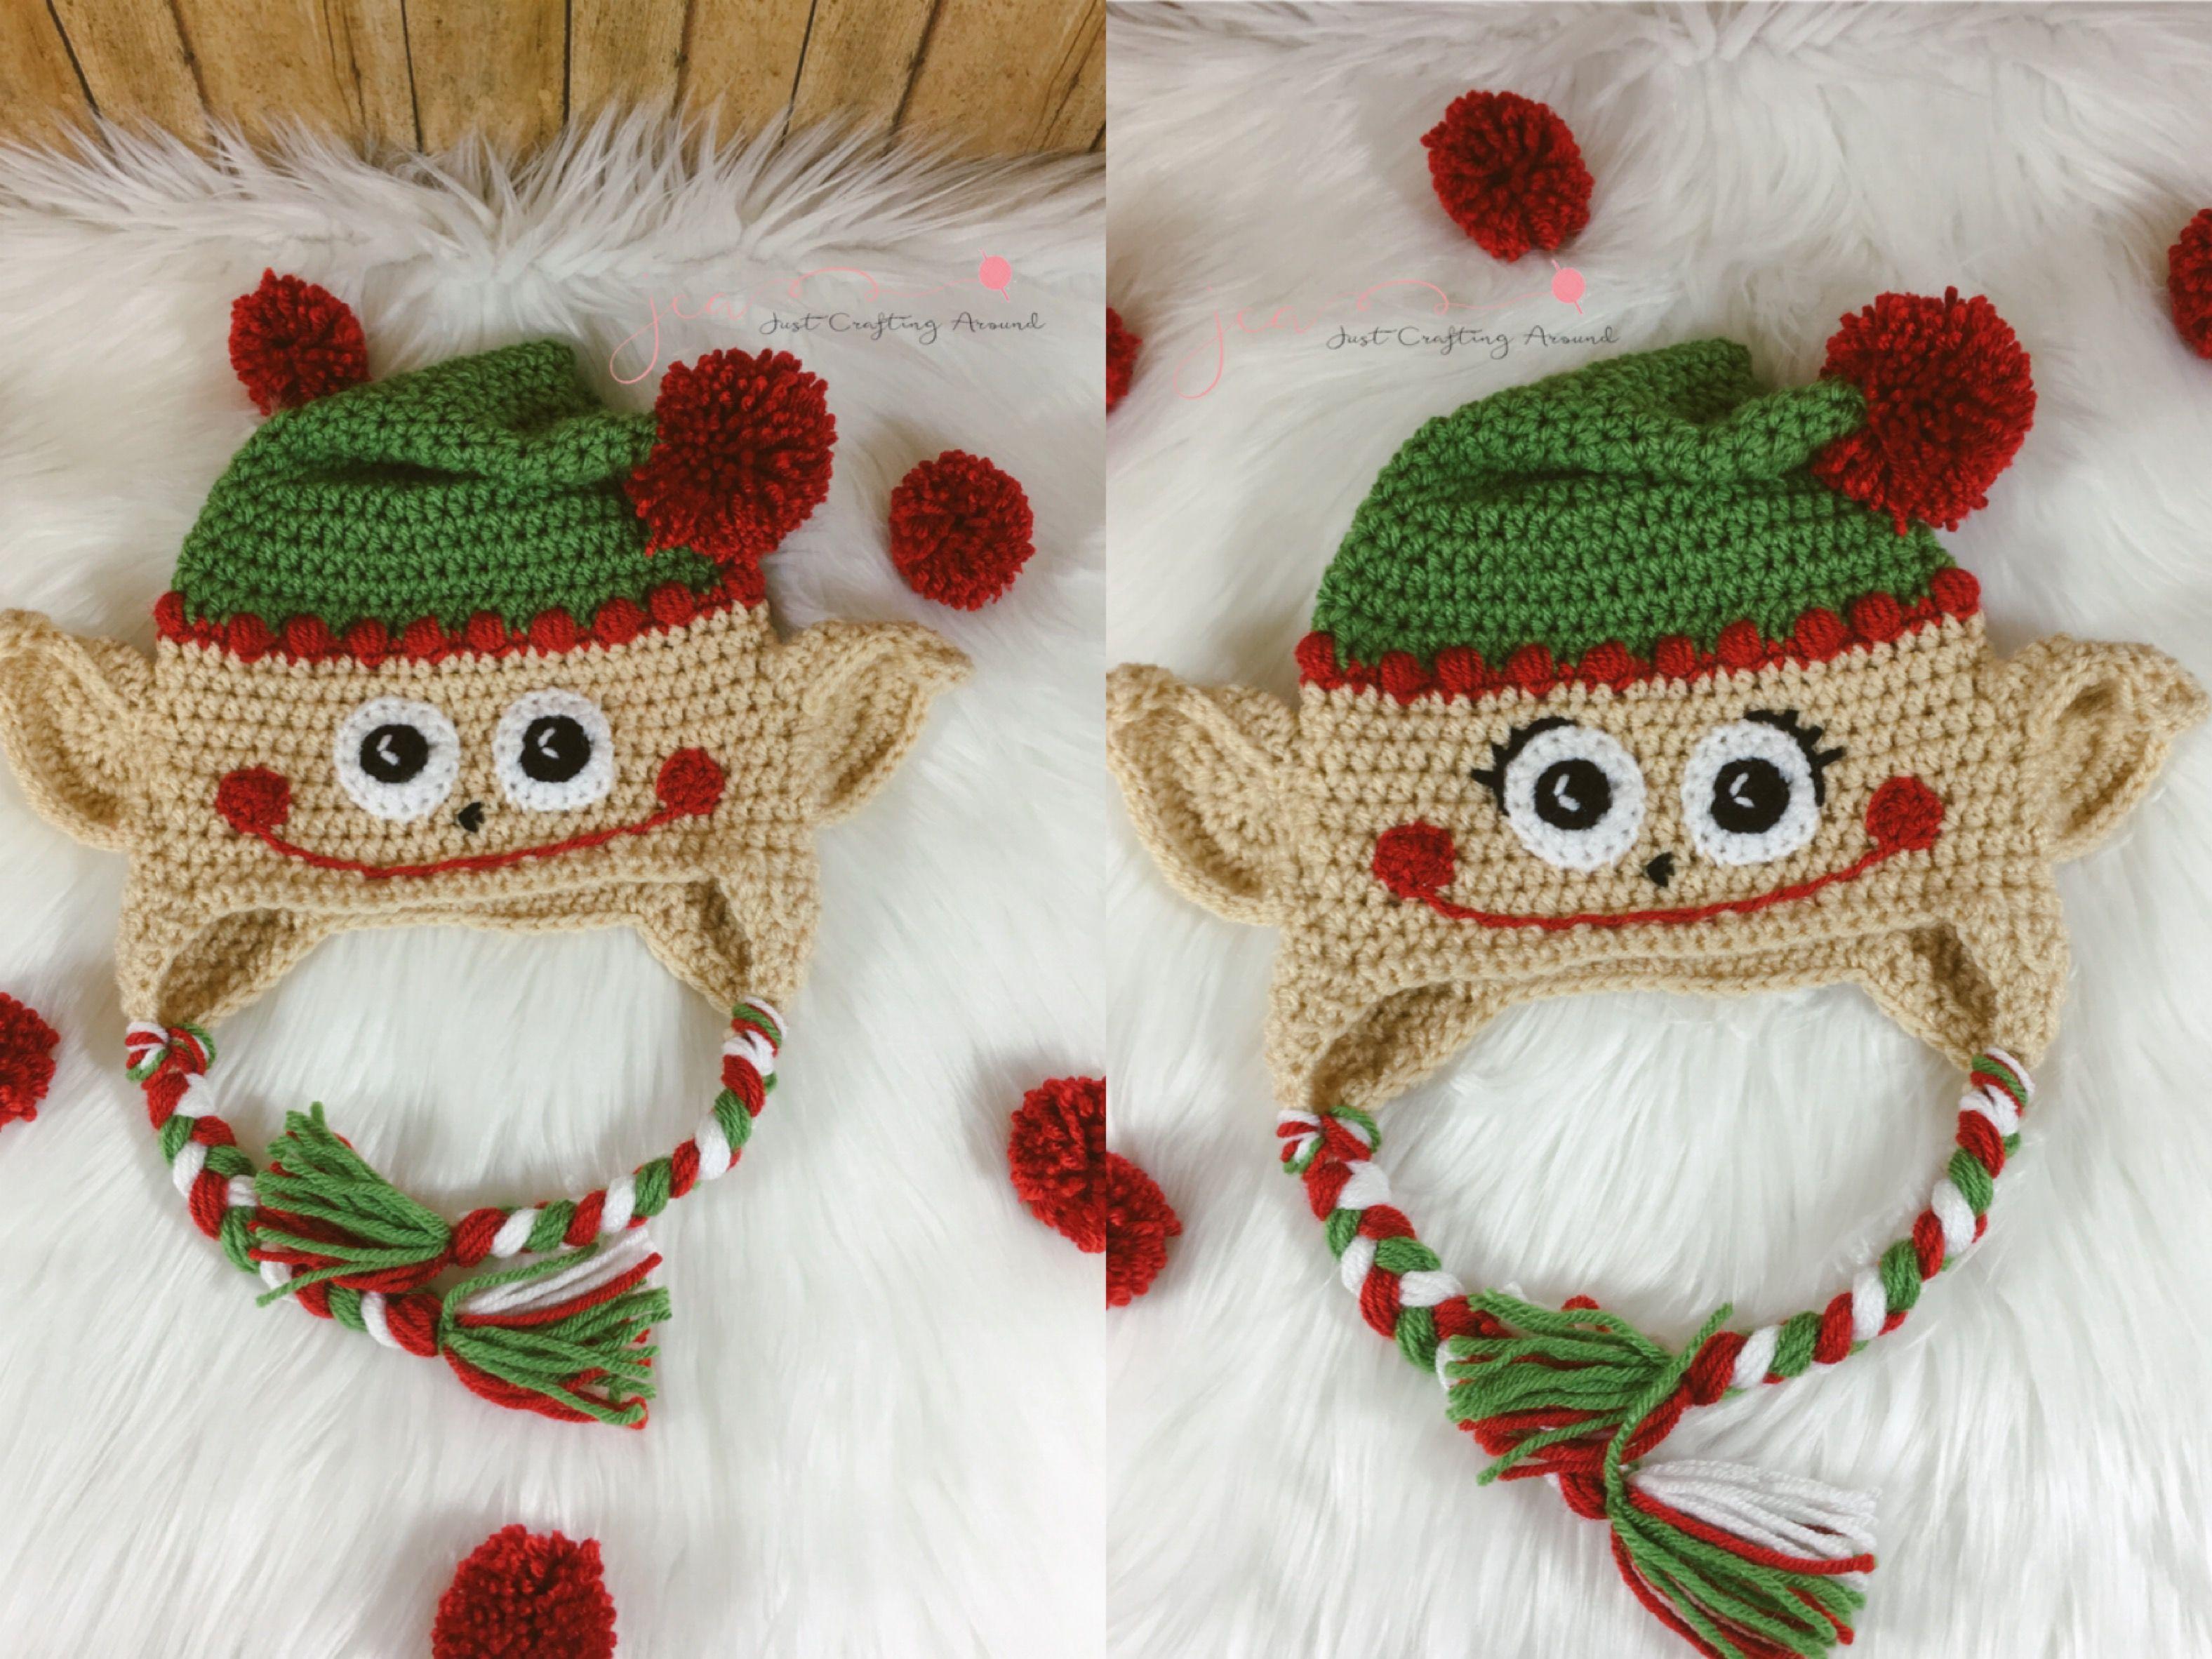 Crochet Elf hat pattern | hats | Pinterest | Elf hat, Elves and Crochet